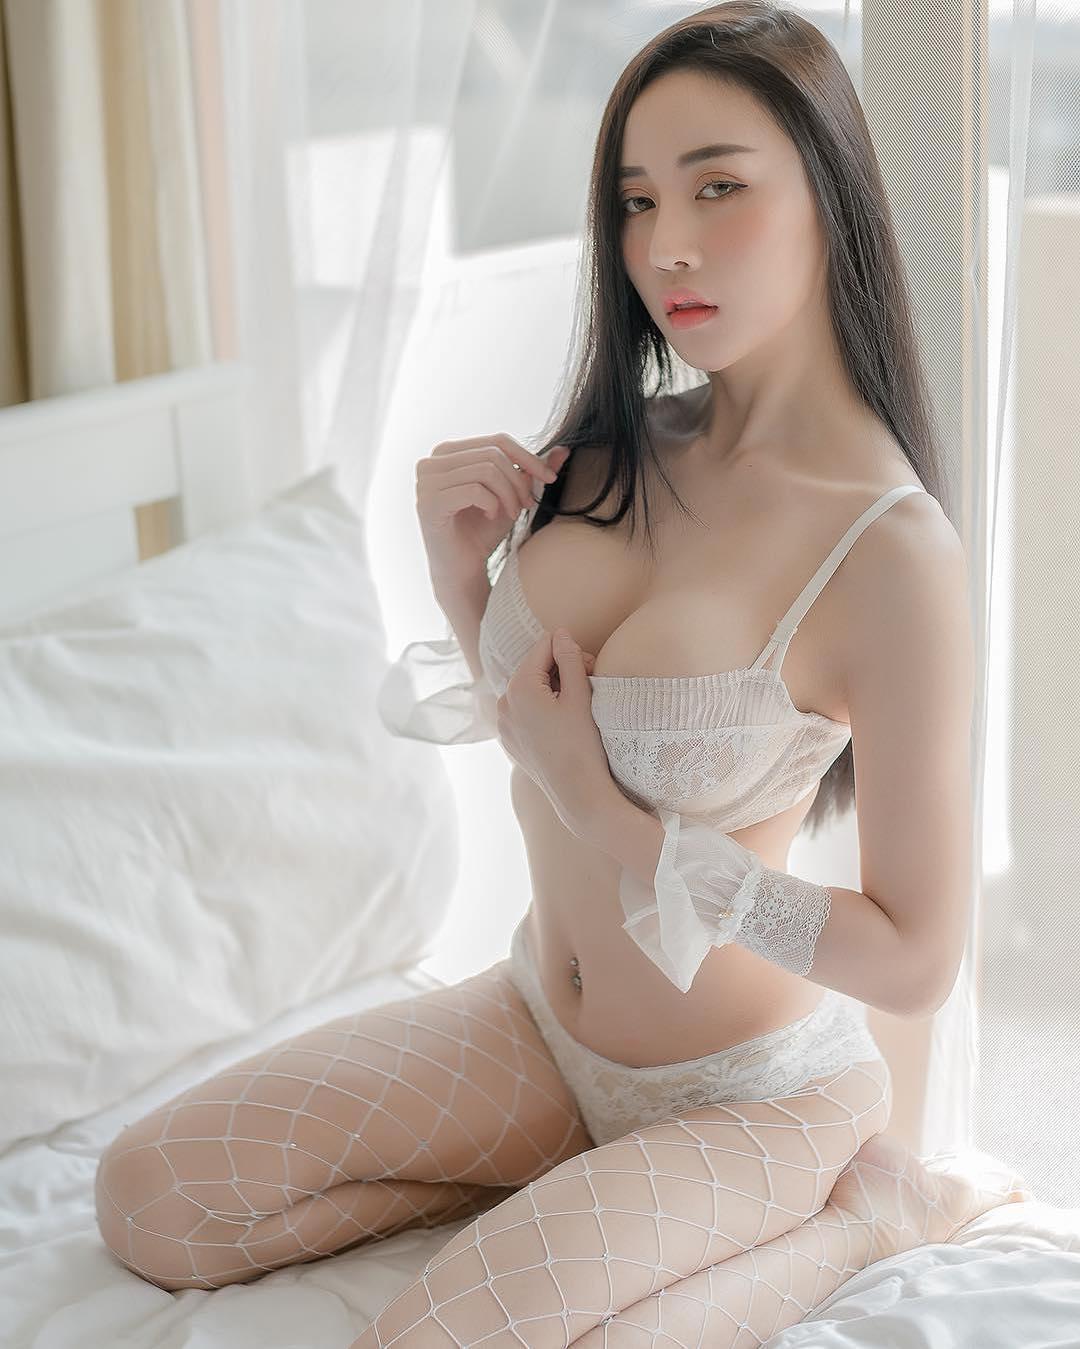 Cerita Sex Jepitan Susu Lydia Yang Tiada Tanding